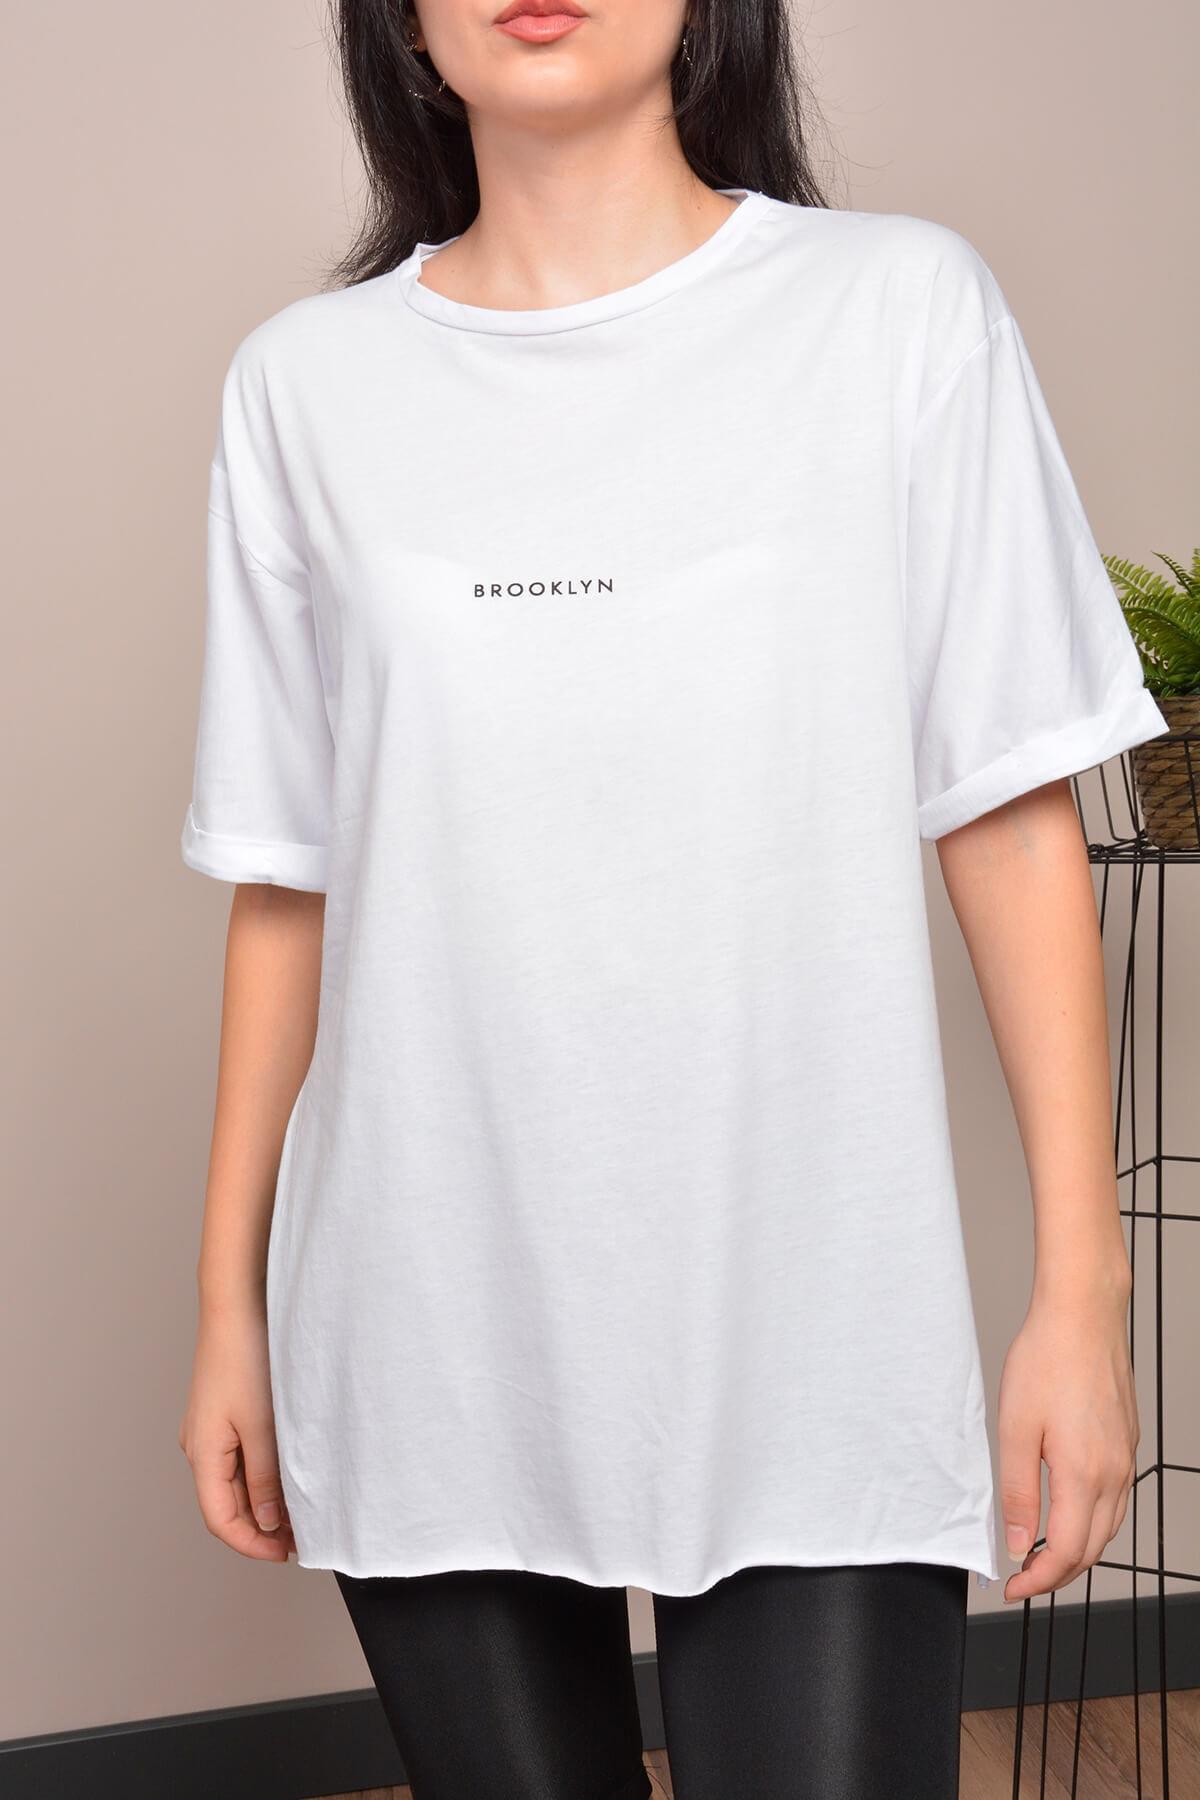 Mossta Kadın Beyaz Yırtmaçlı Lazer Kesim T-shirt 2